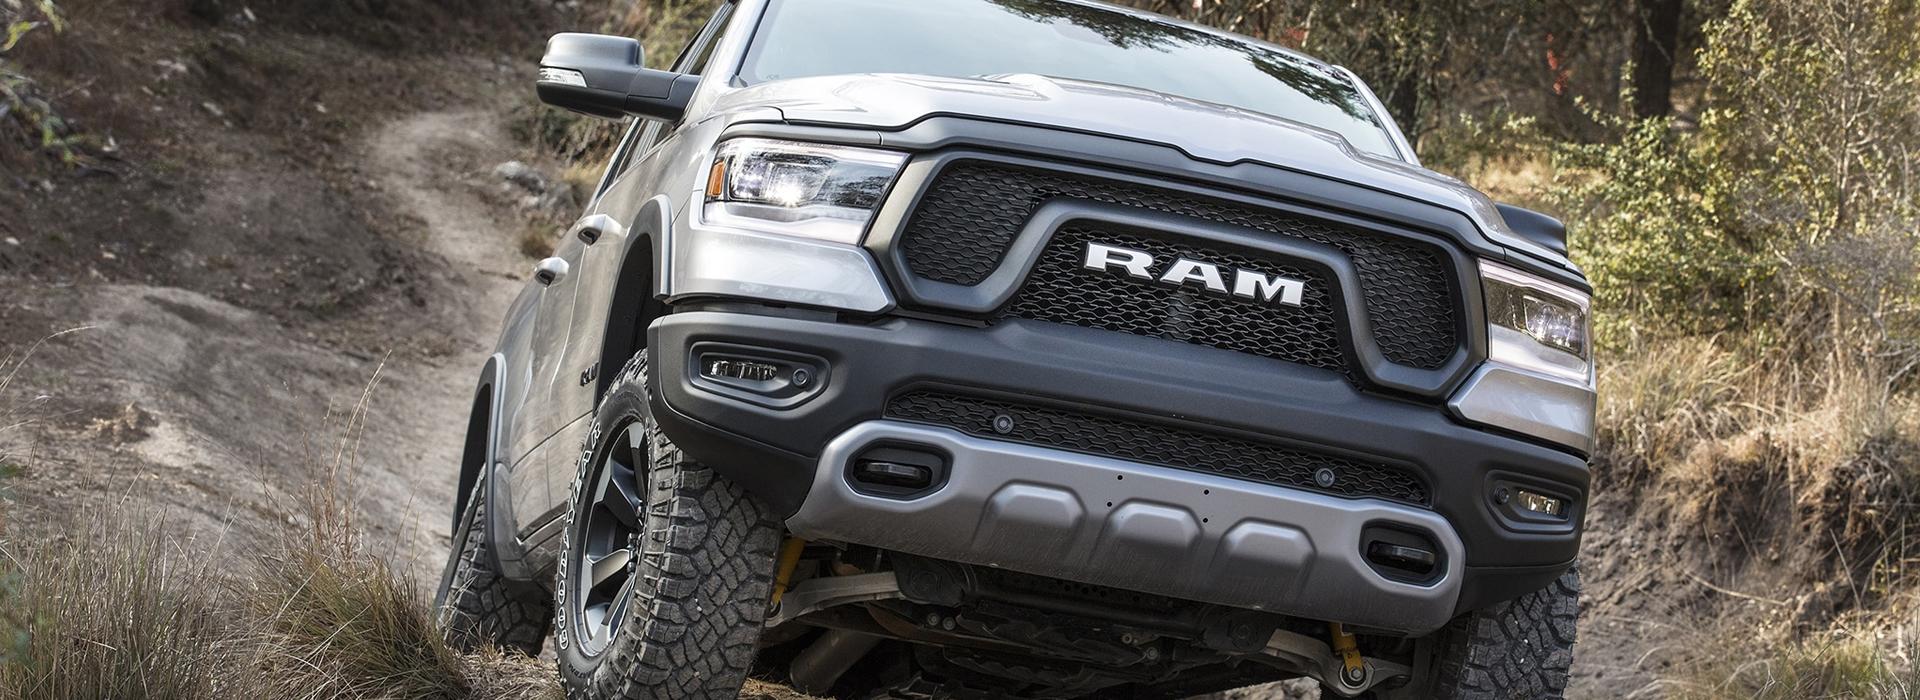 Ram 1500 Rebel offroad